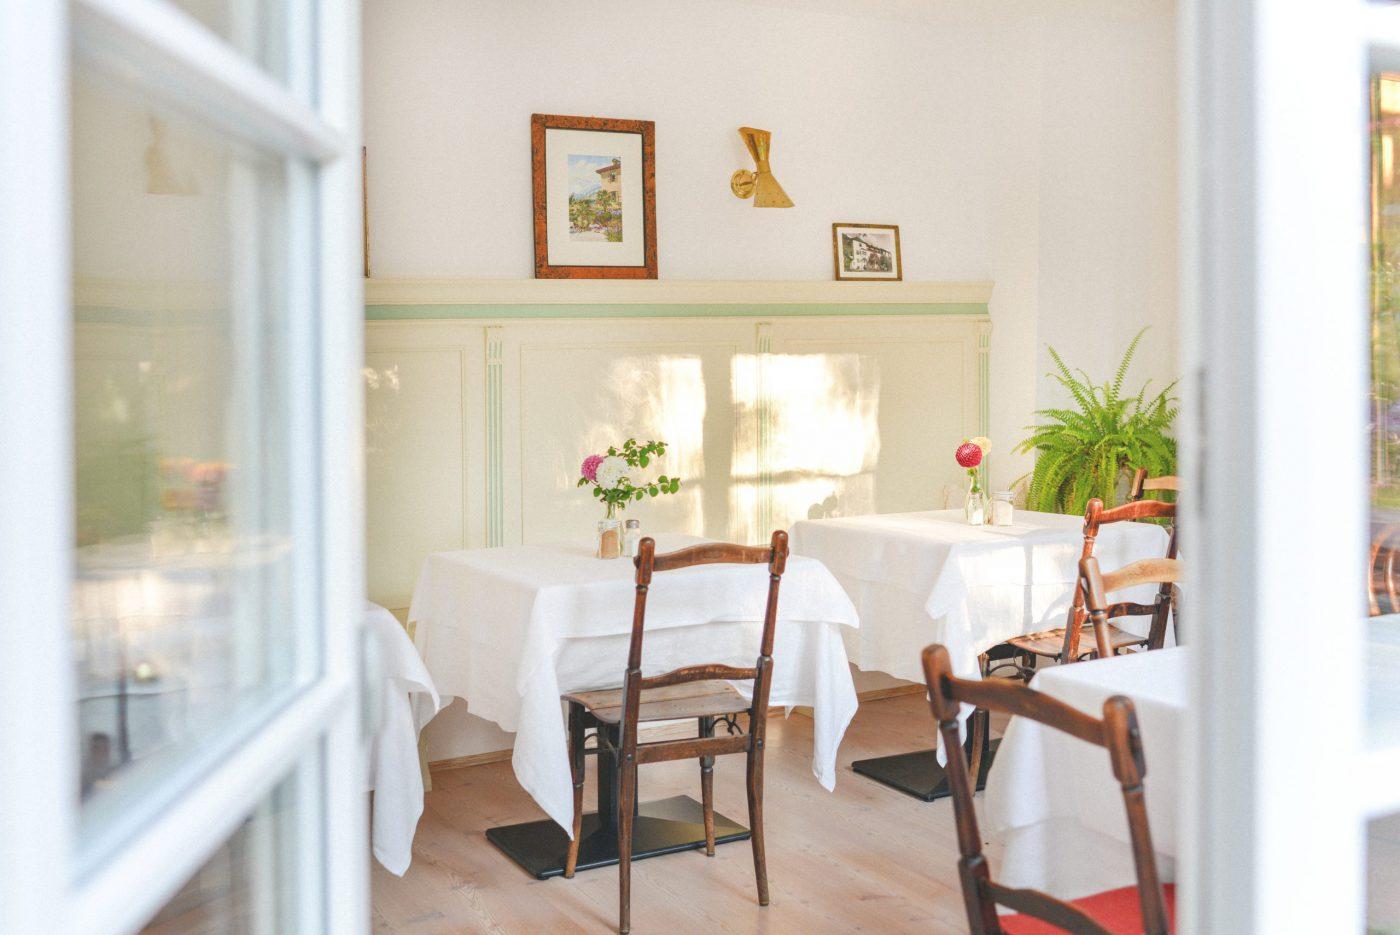 Ottmanngut Suite and Breakfast - Merano South Tyrol